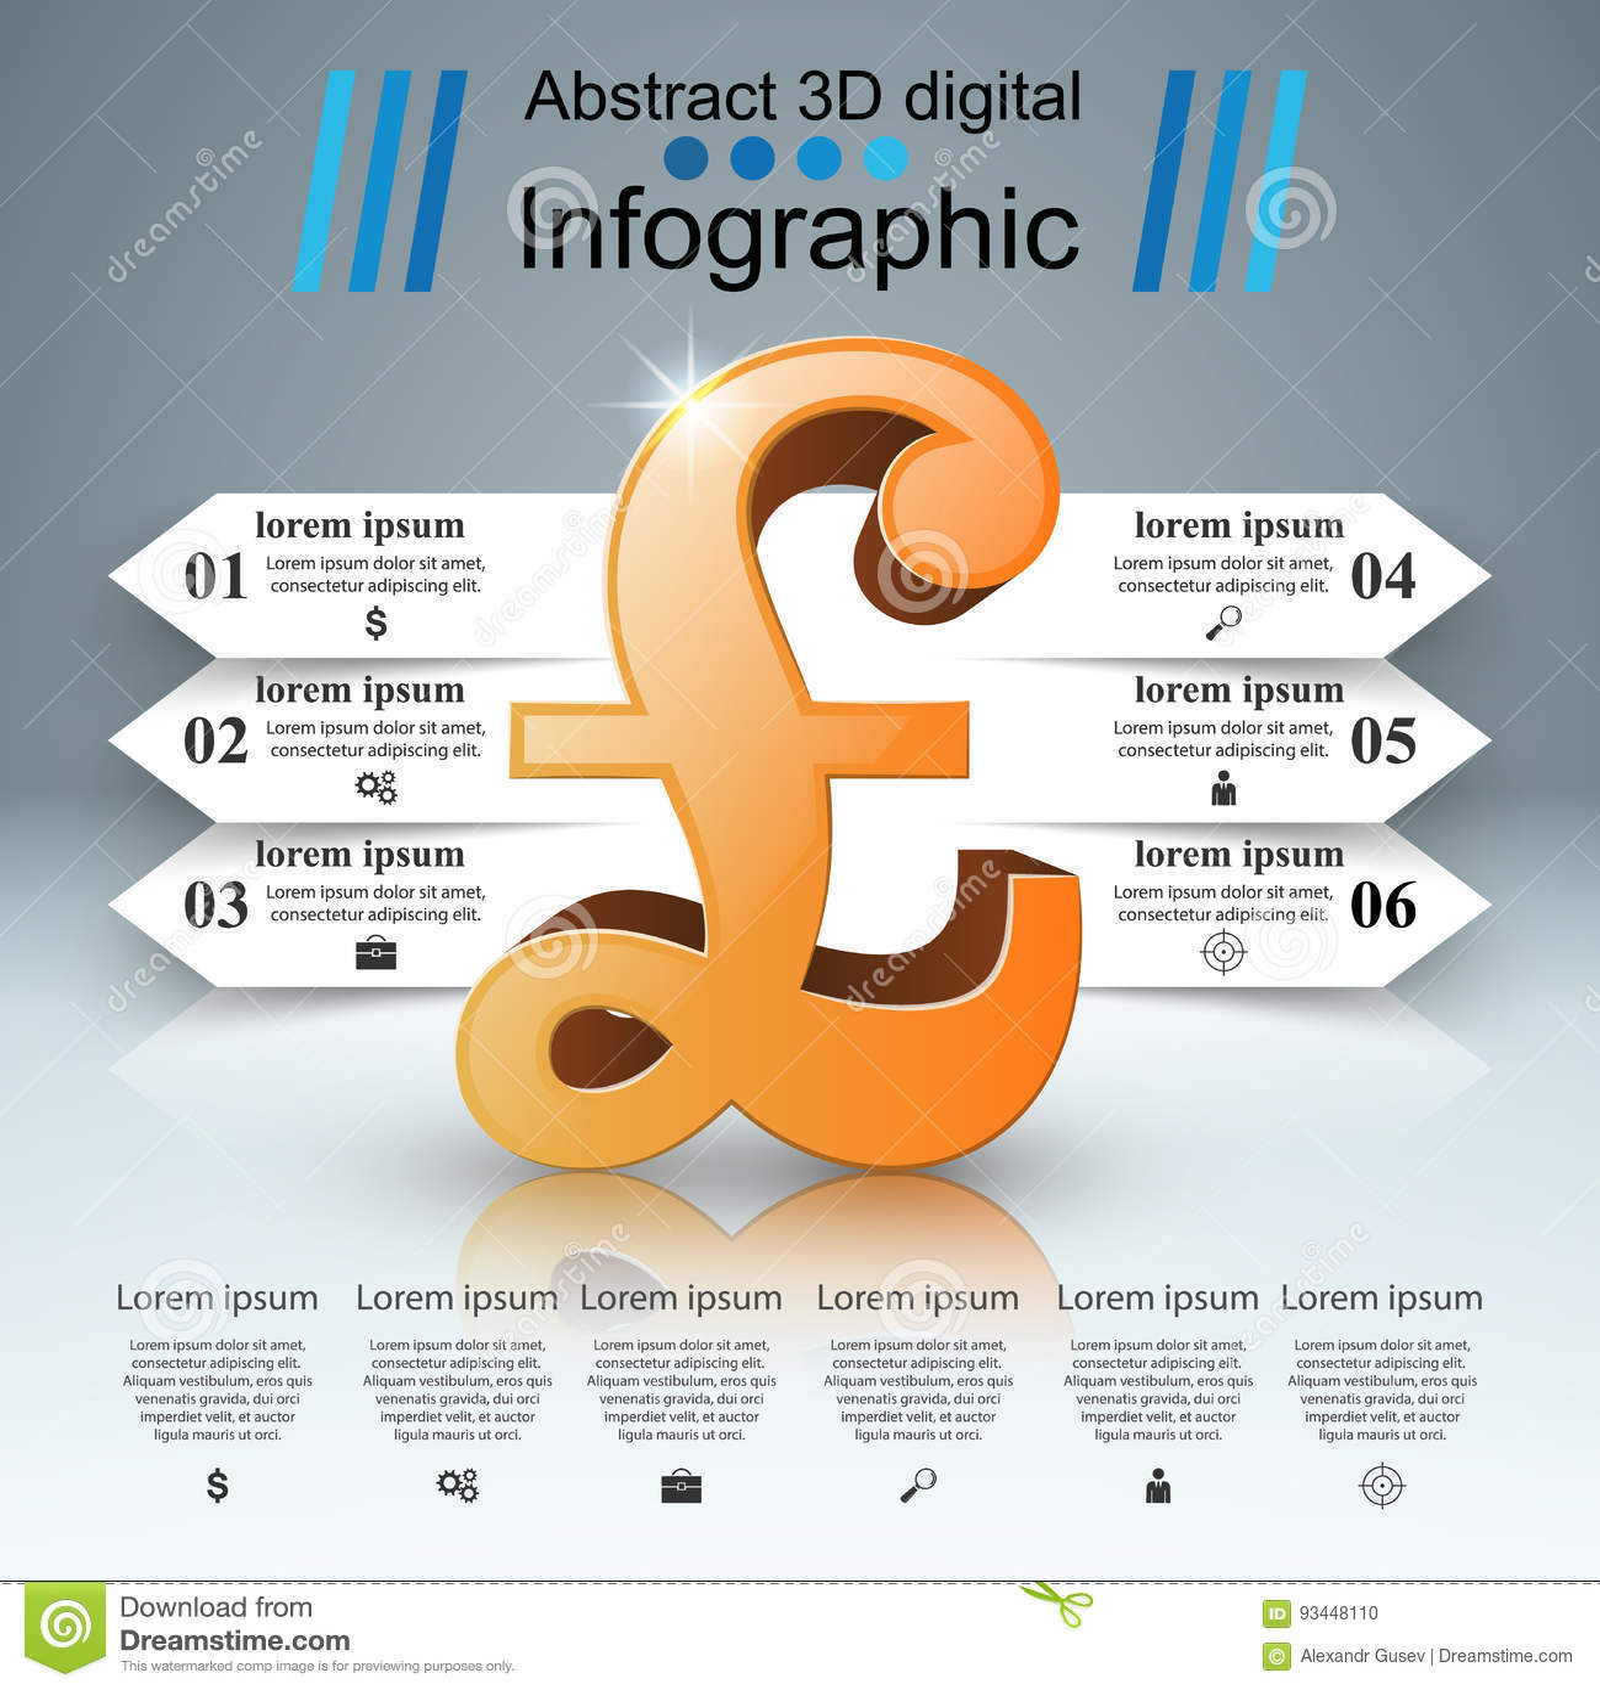 3D Infographic Английский фунт, значок денег